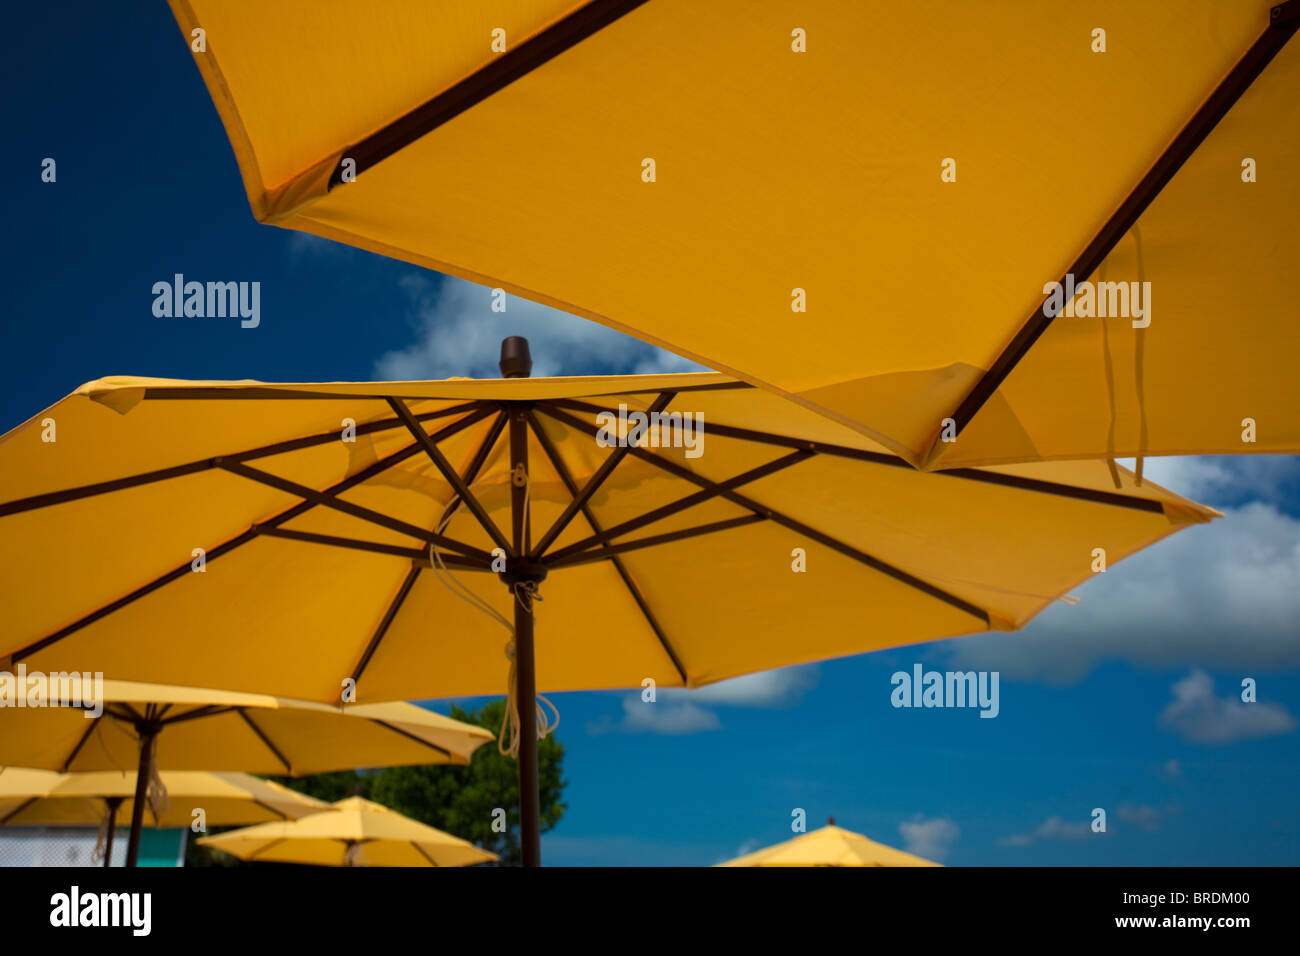 Gelb gold Strand Sonnenschirme tropischen Umgebung Stockbild